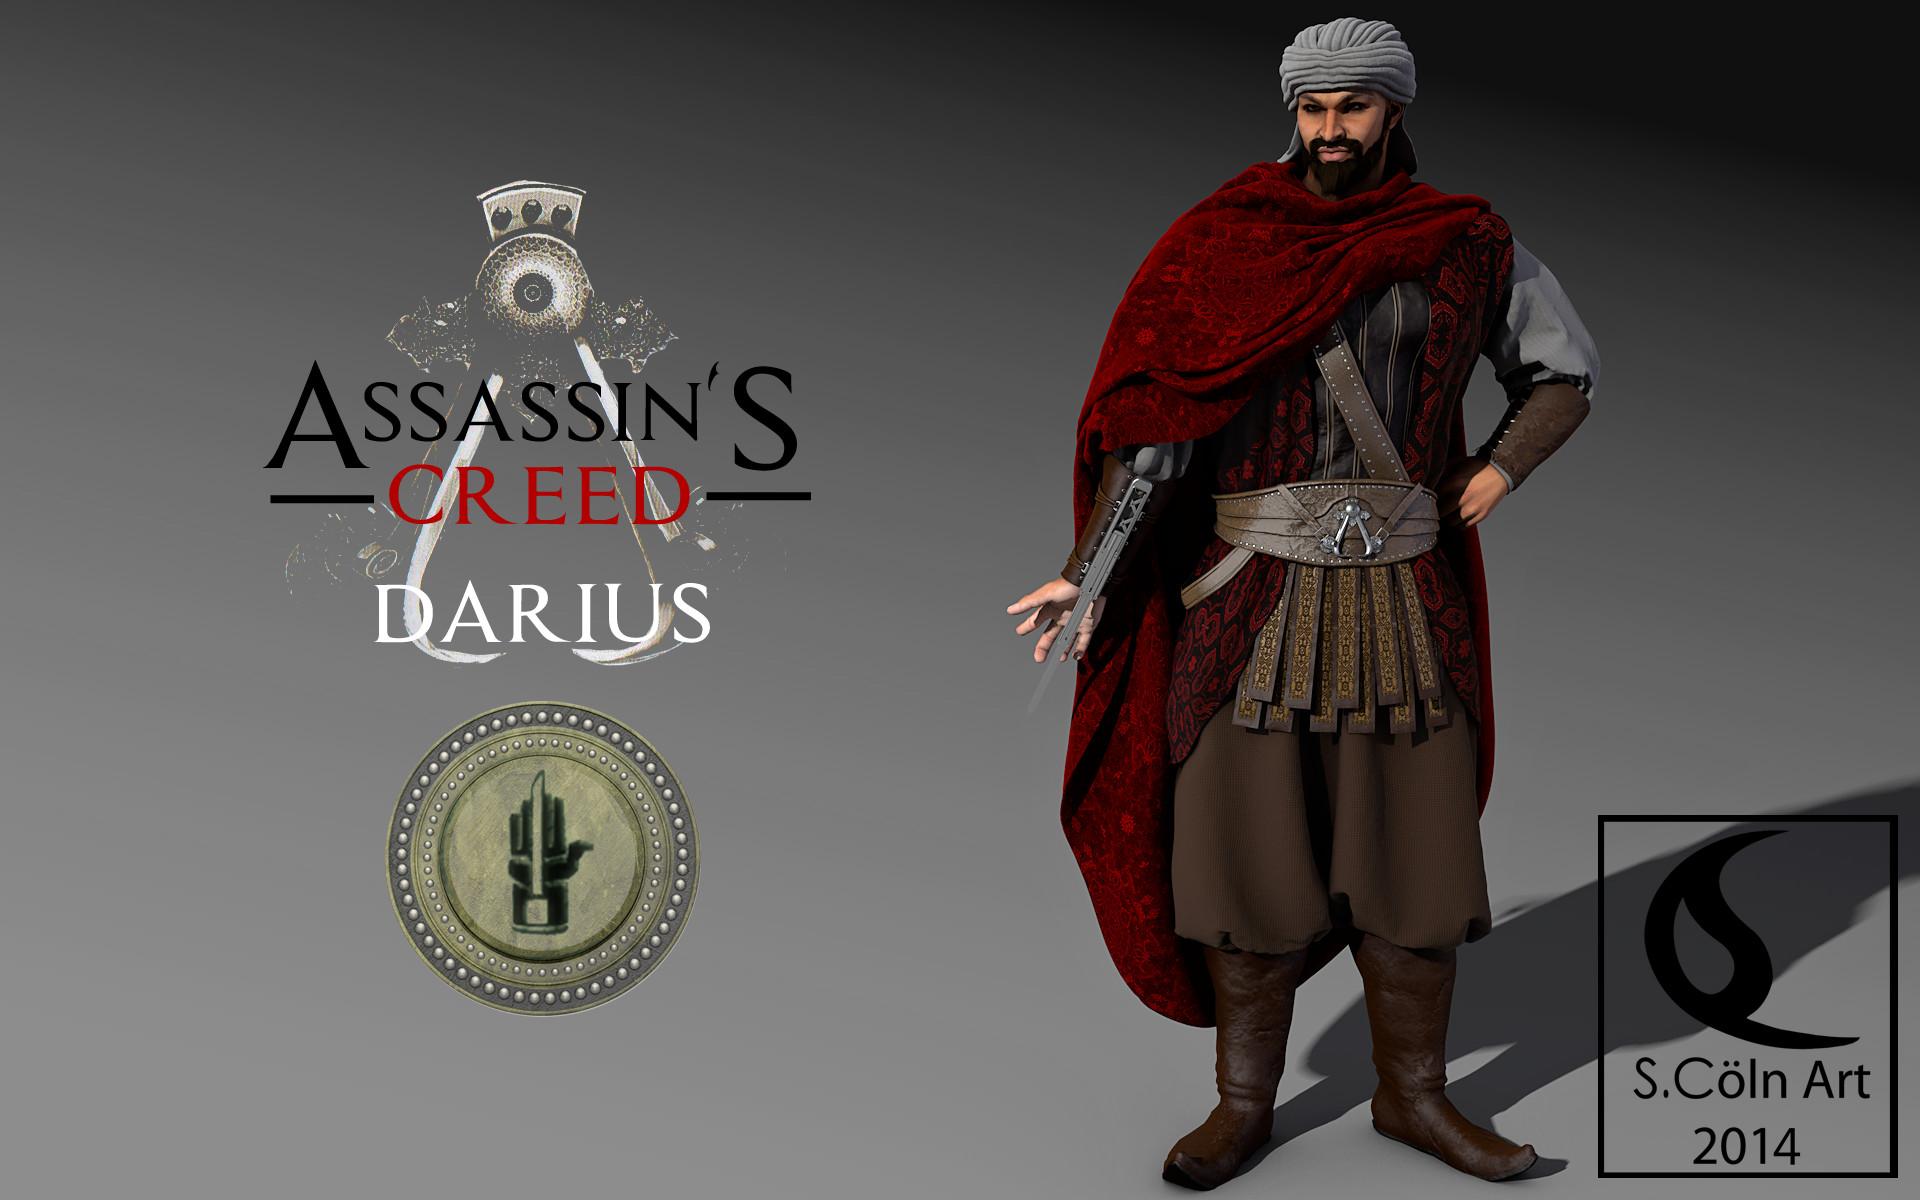 Assassin S Creed Darius 2 By Yowan2008 On Deviantart